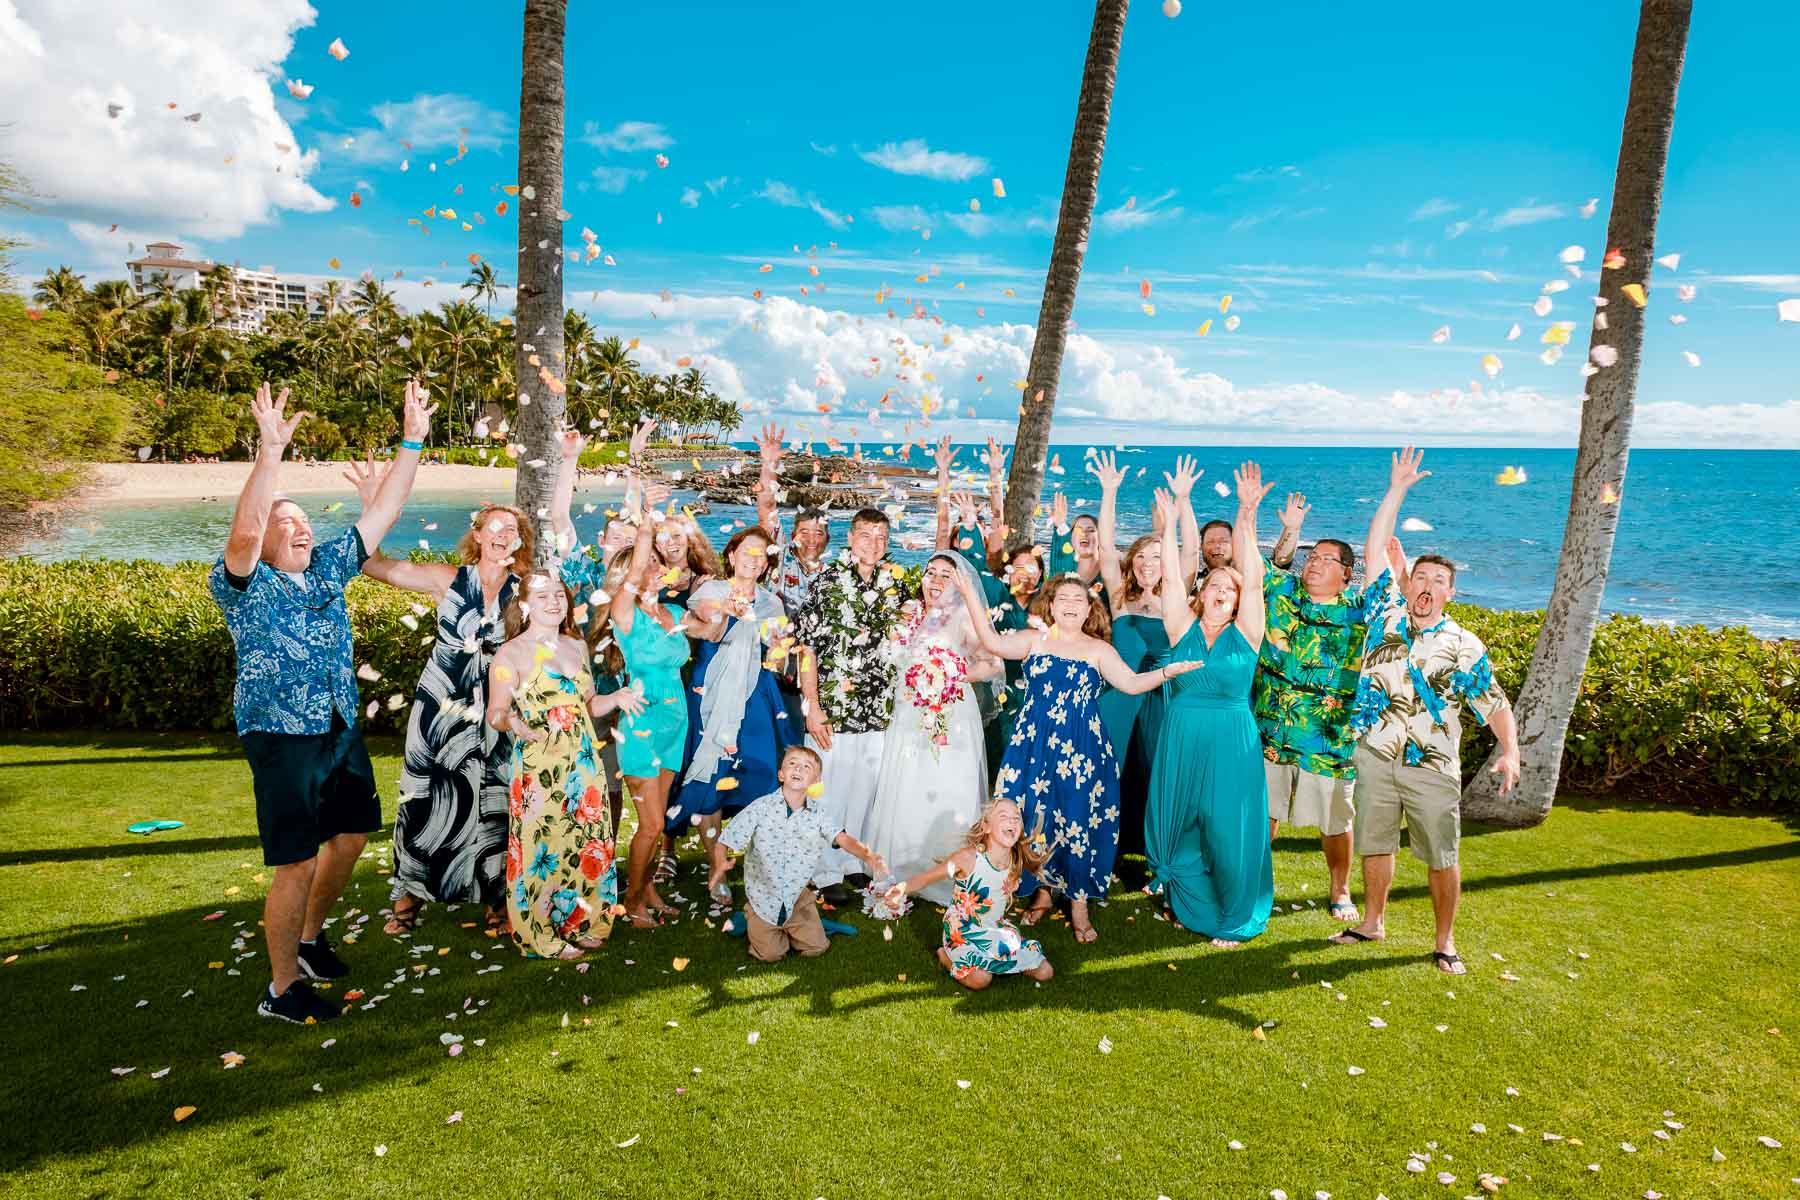 after wedding bridal party celebration flower petal shower oahu hawaii beach